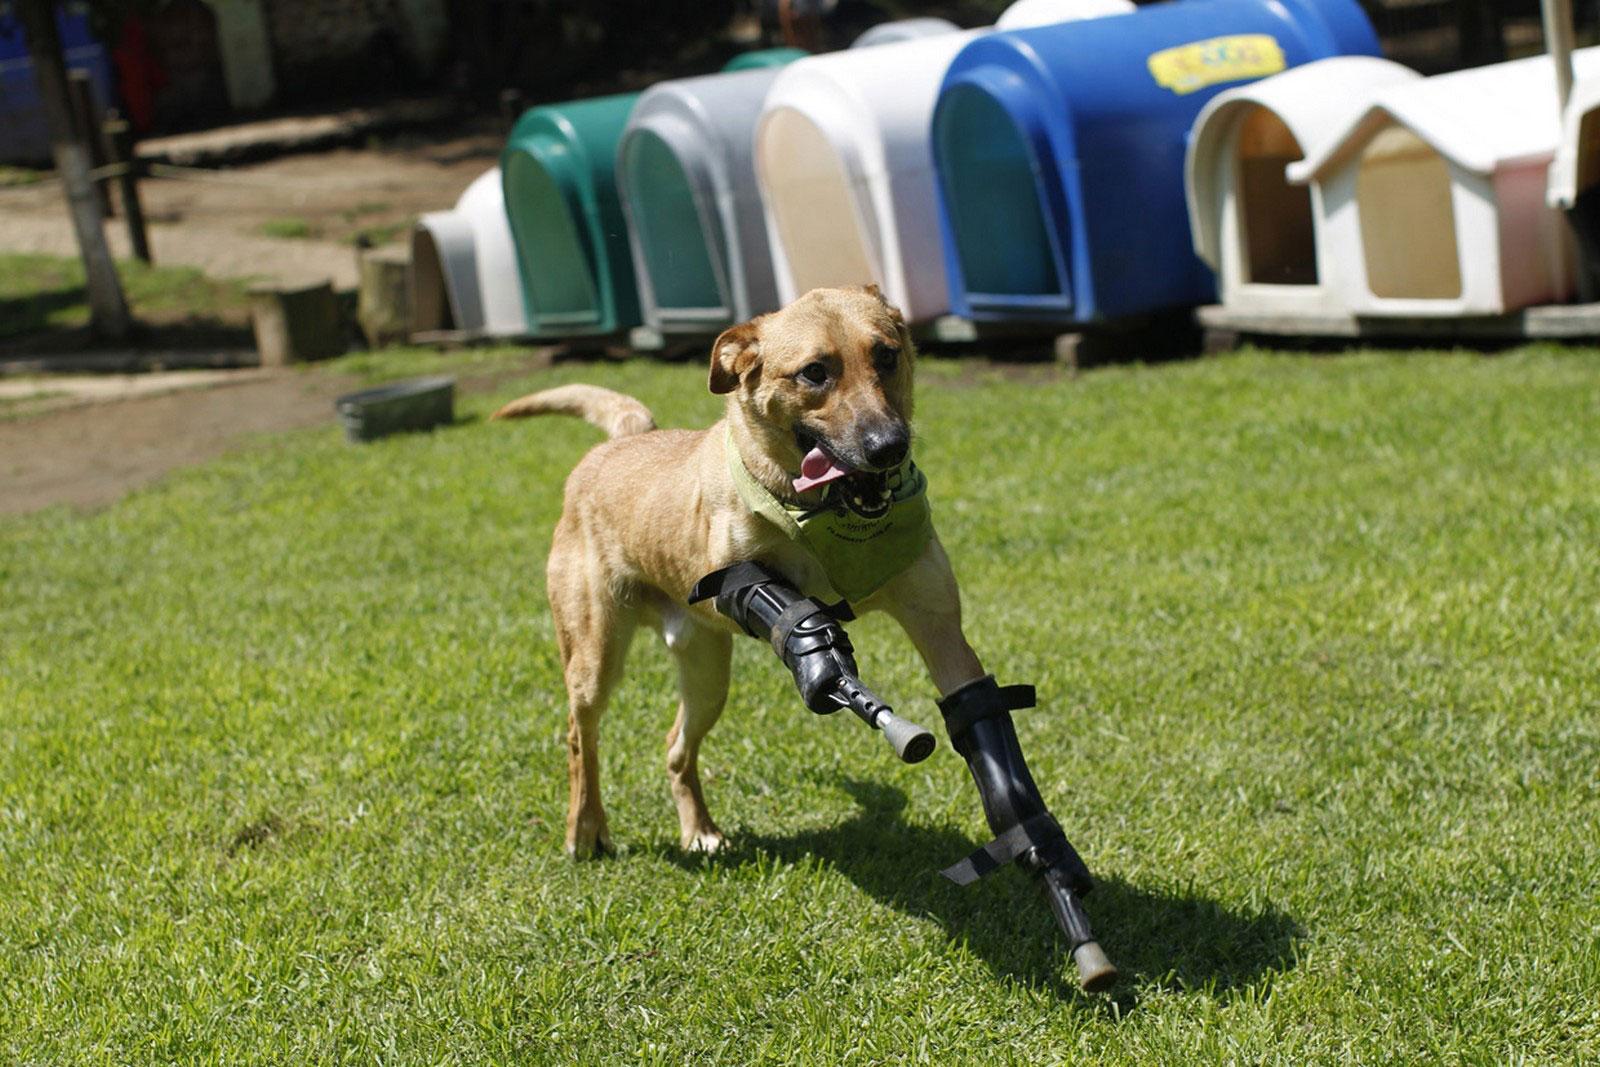 собака с протезами вместо лап